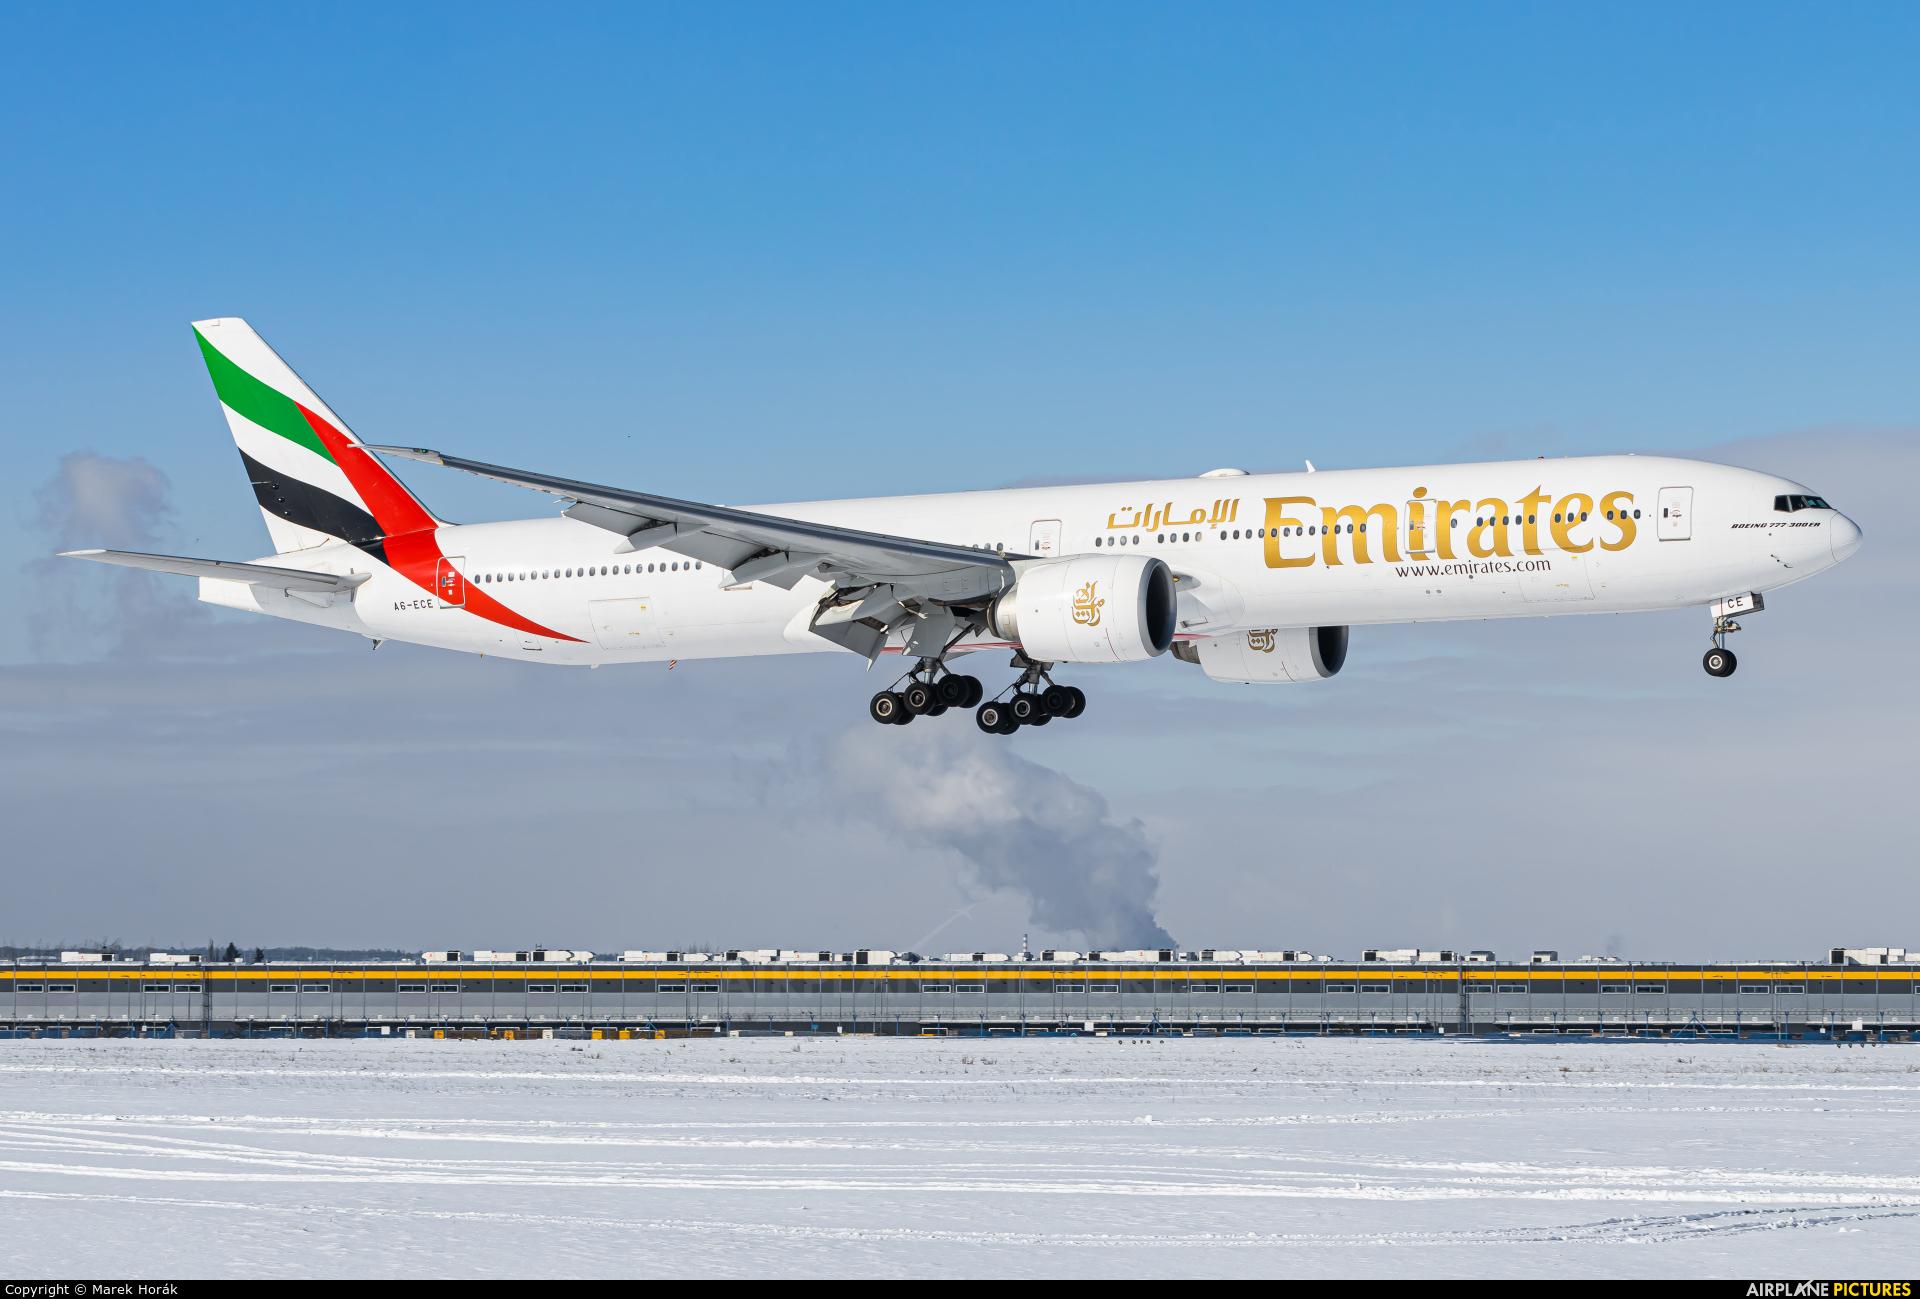 Emirates Airlines A6-ECE aircraft at Prague - Václav Havel